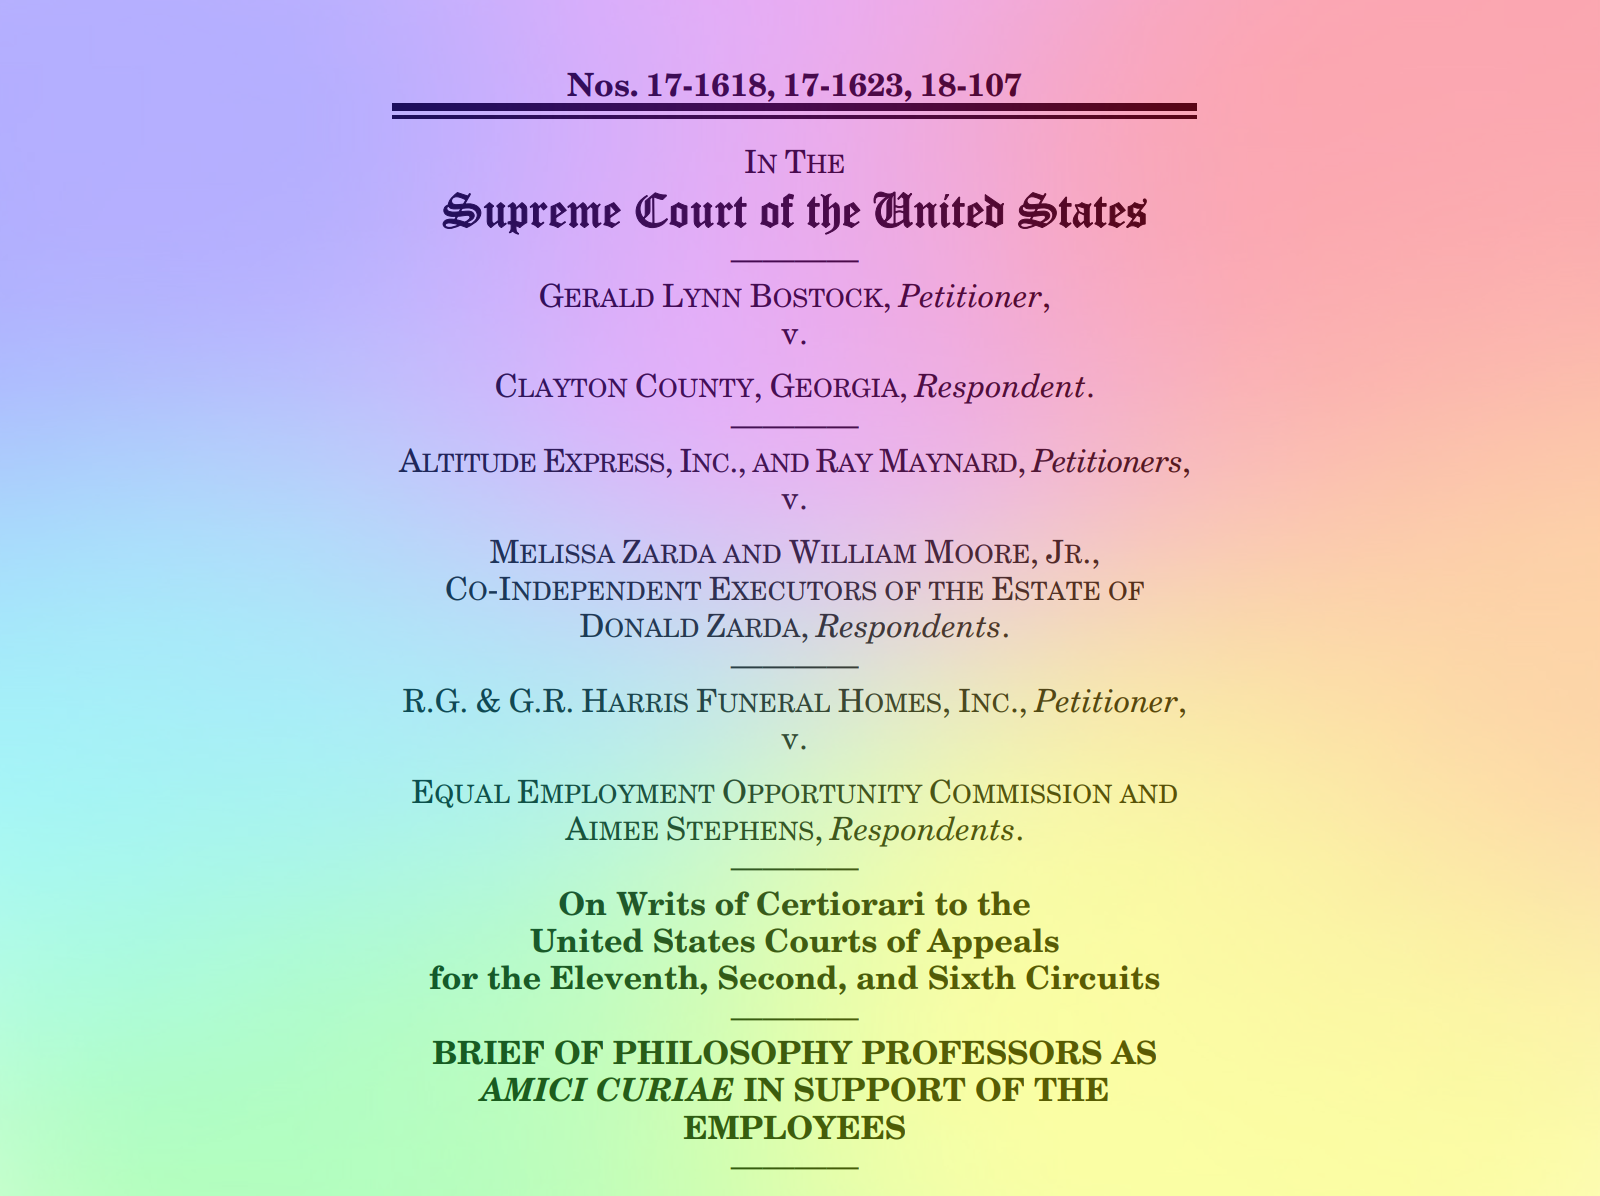 Philosophers File Amicus Brief on LGBT Discrimination Cases